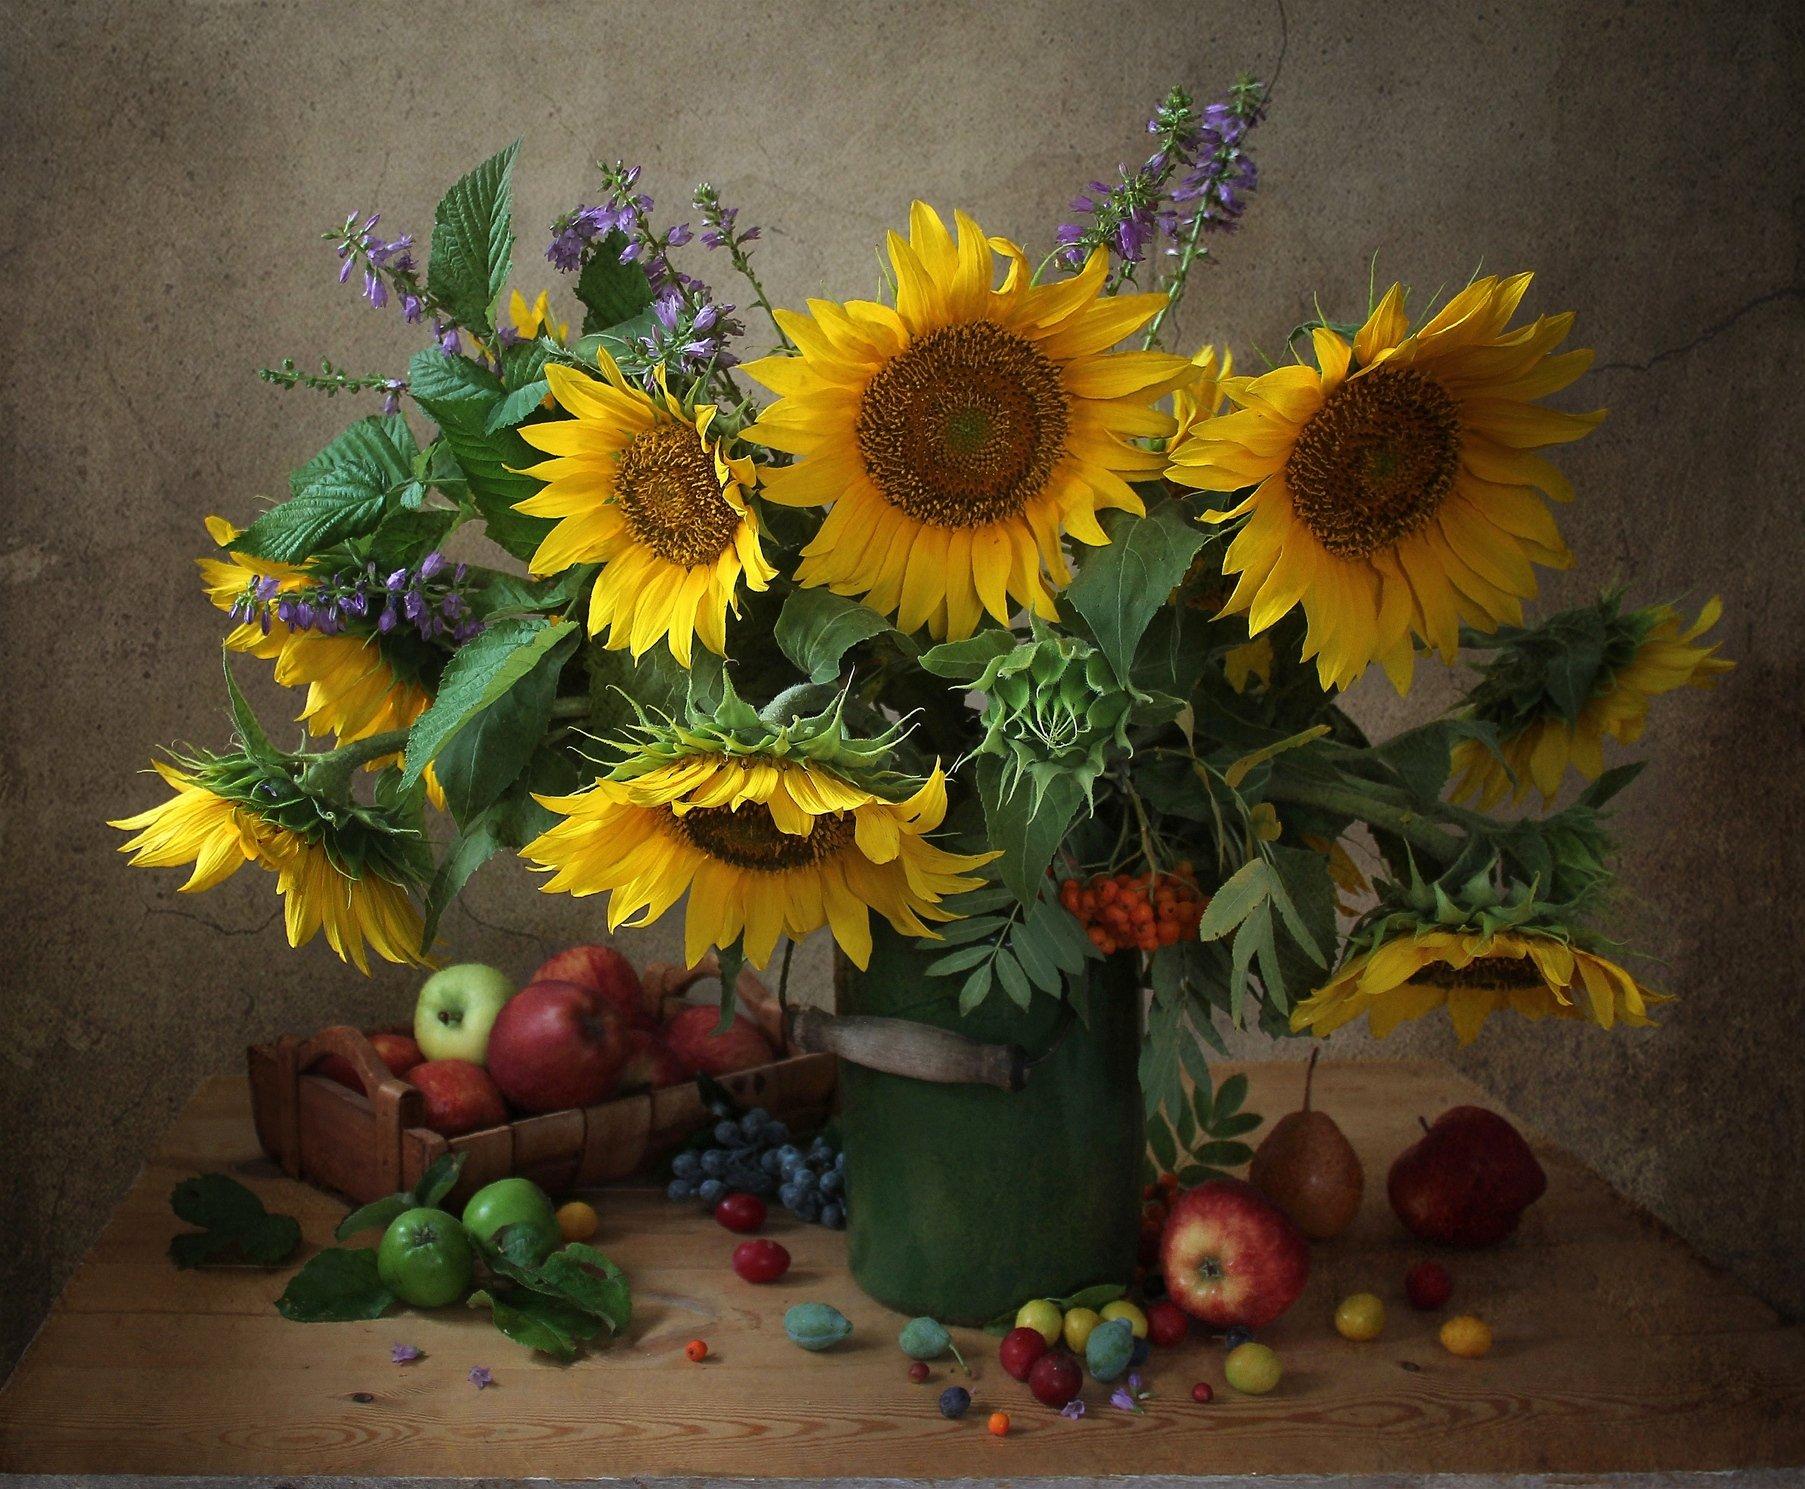 натюрморт, цветы, марина филатова, подсолнухи, яблоки, Марина Филатова